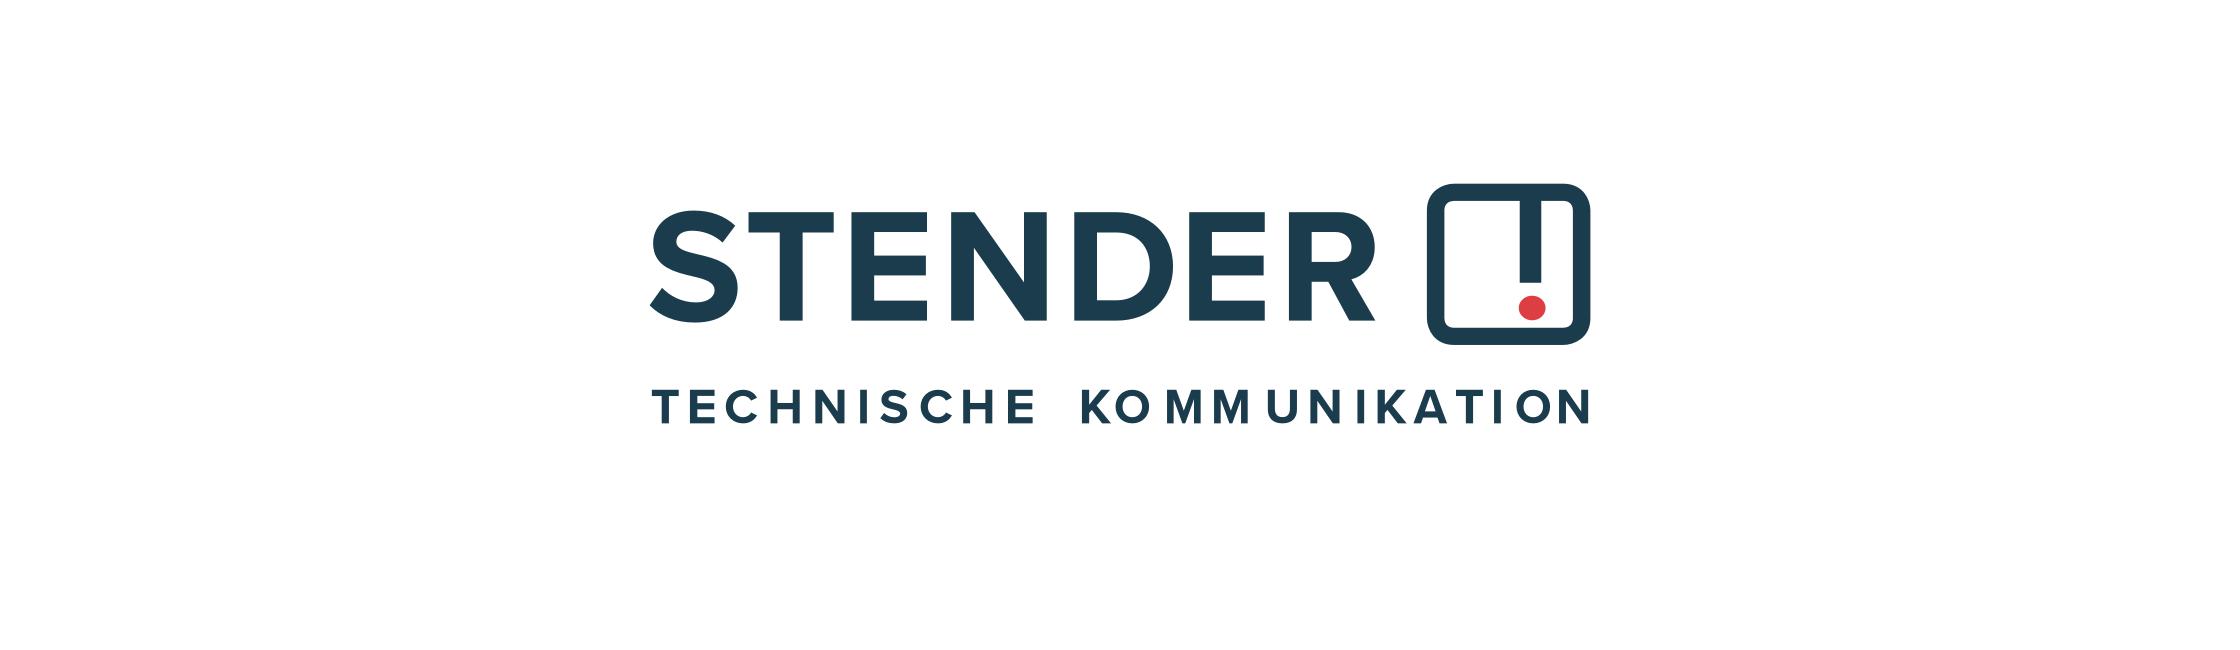 Stender GmbH Logo